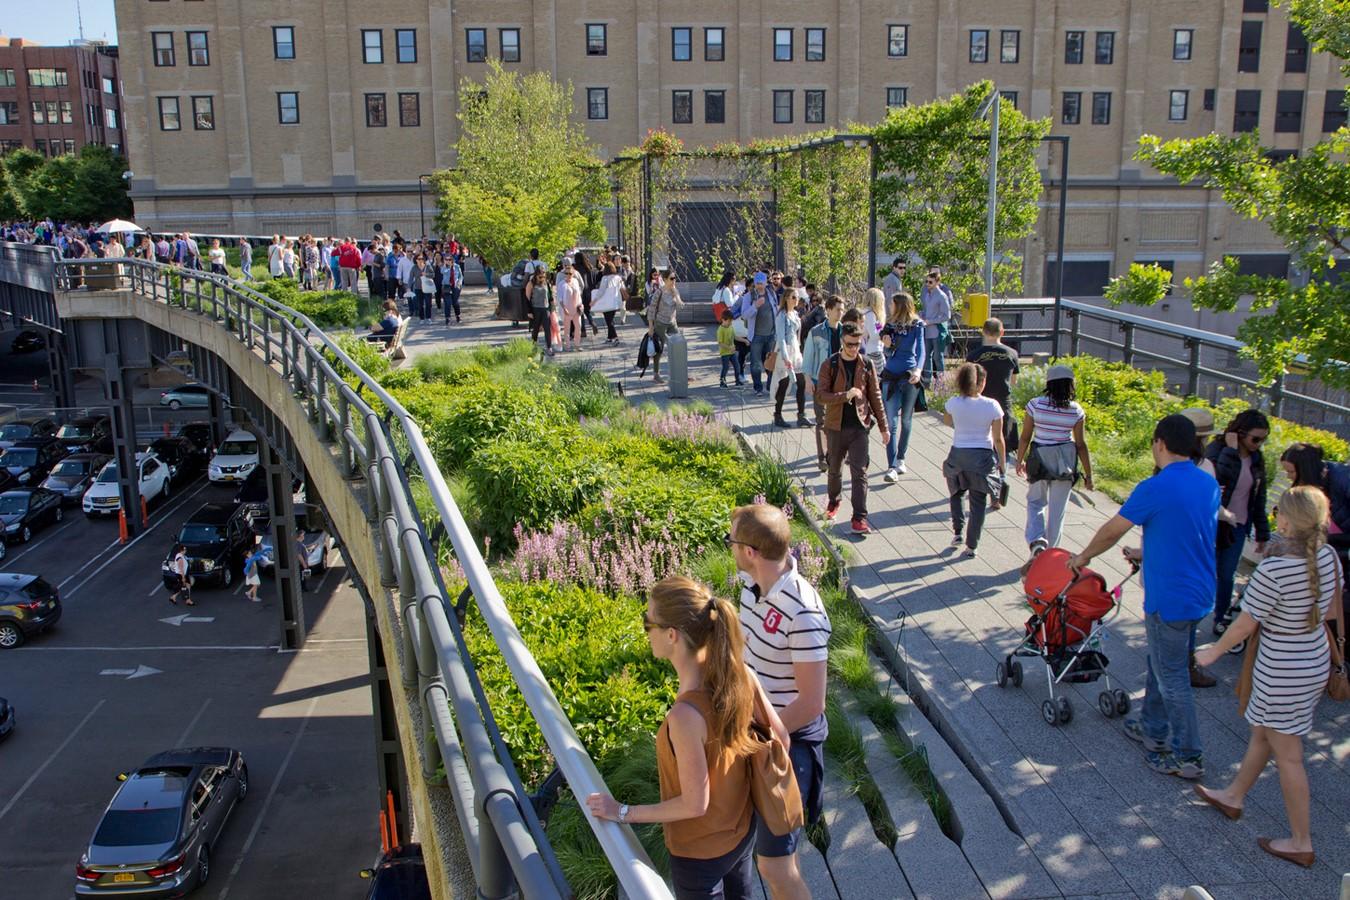 Urban regeneration through public space - Sheet2